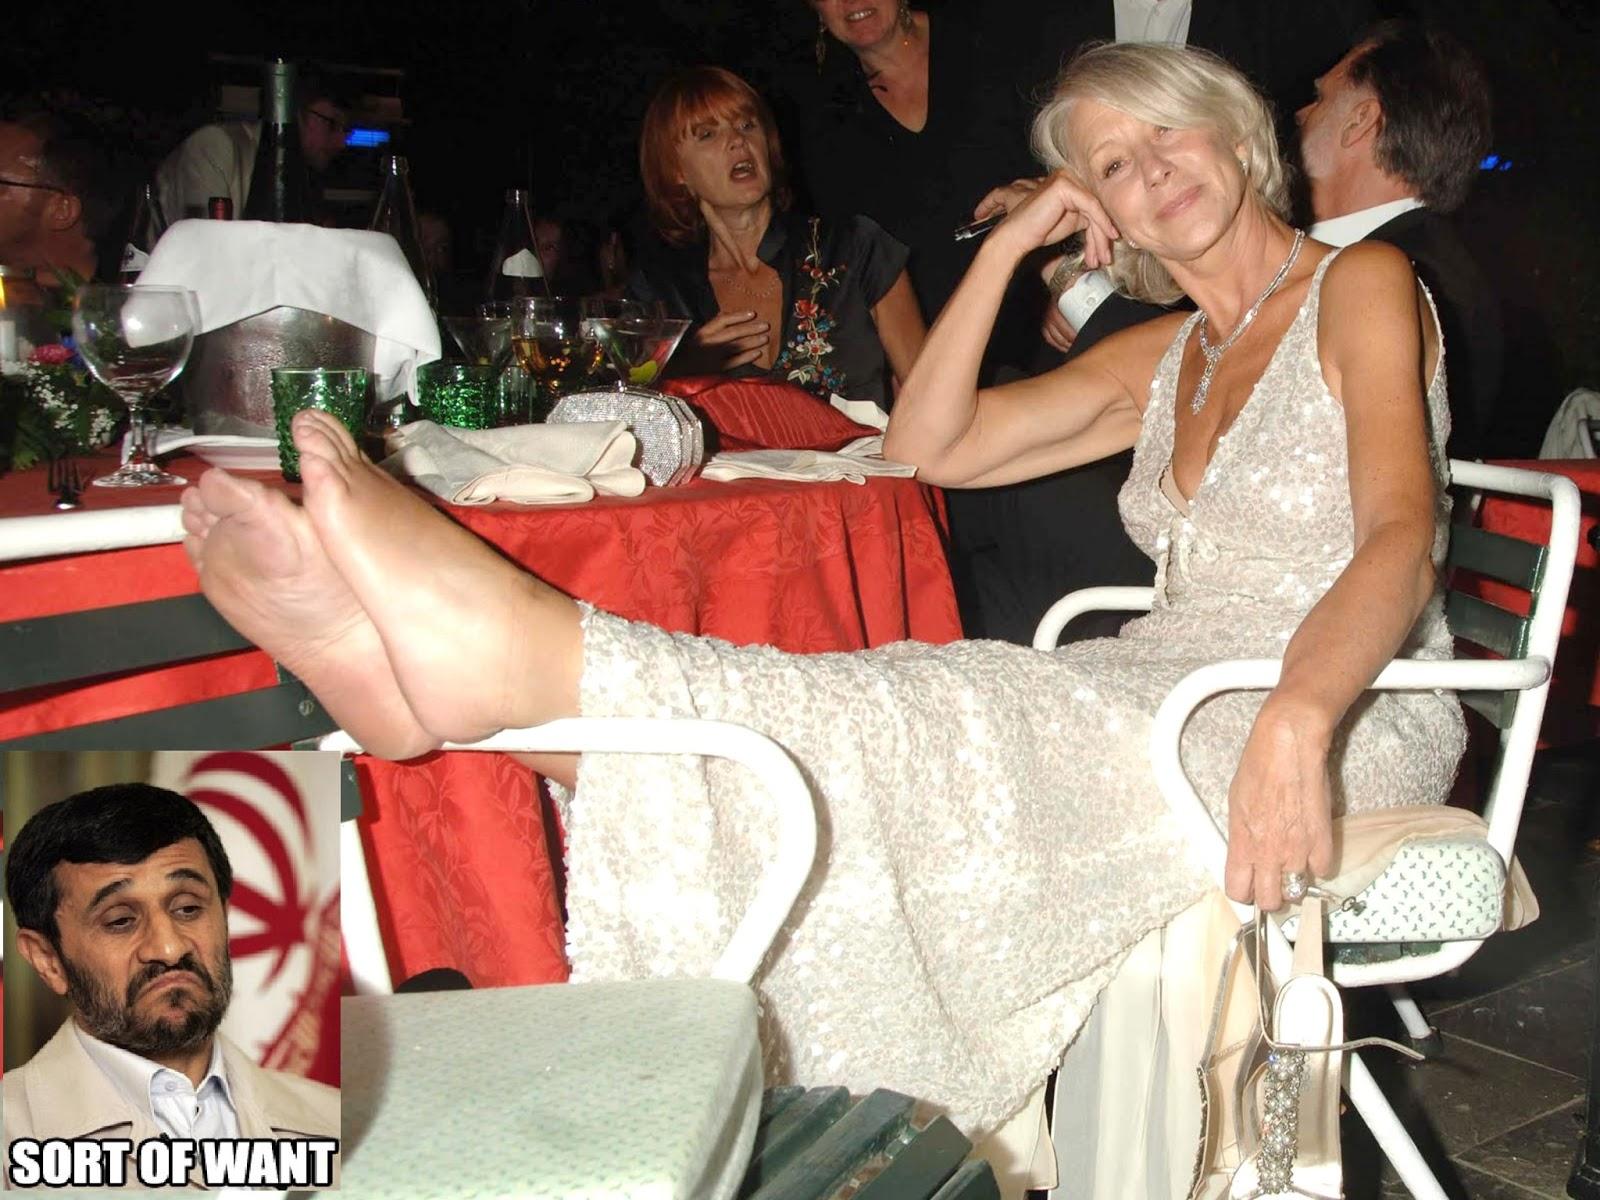 http://1.bp.blogspot.com/-X5Il_IXrOV4/USWHtUb24JI/AAAAAAAABsk/ozy6_i8HcUs/s1600/Helen_Mirren_feet.jpg